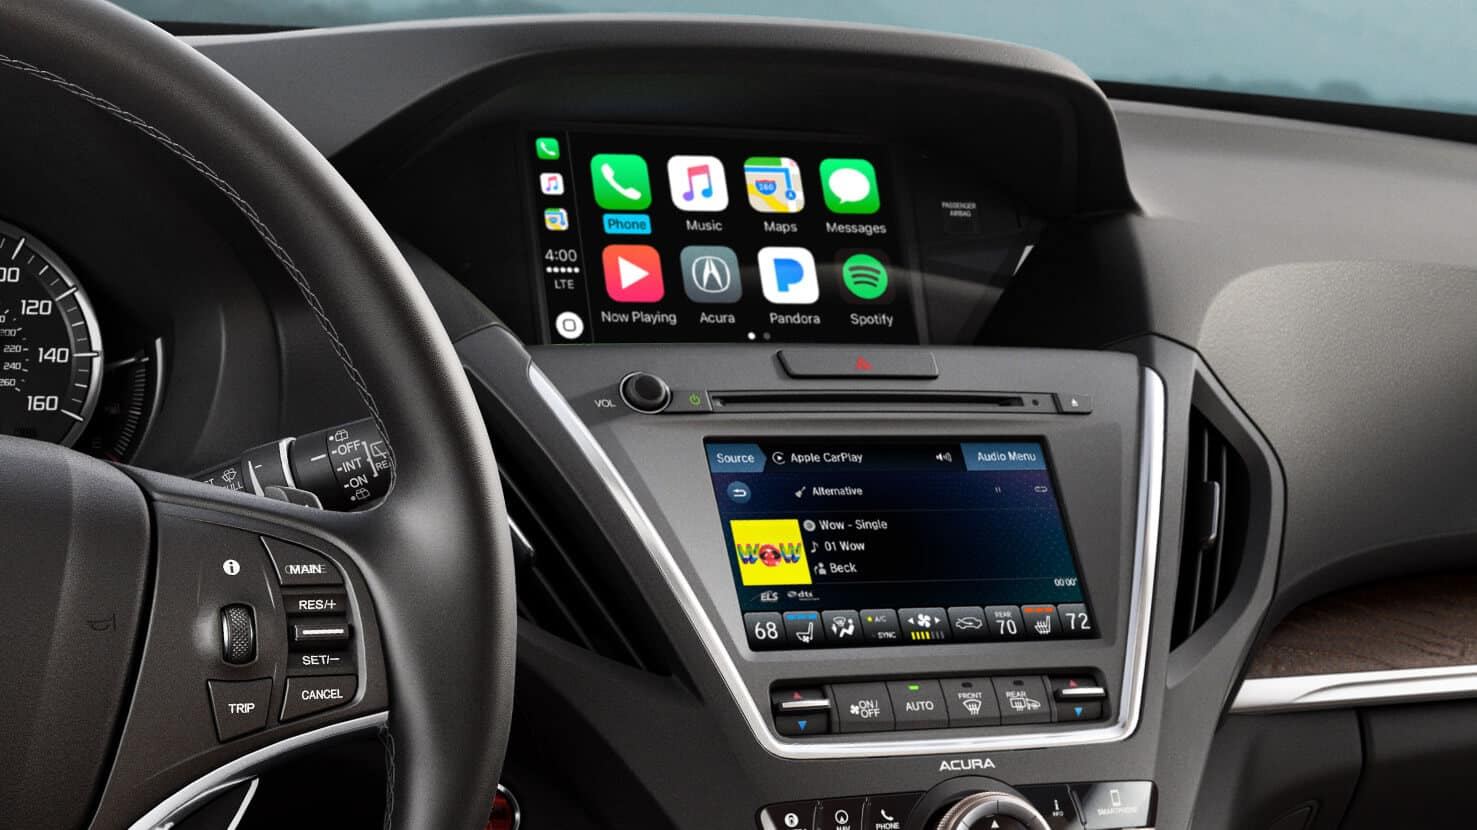 2018 Acura MDX Interior Tech Center Stack